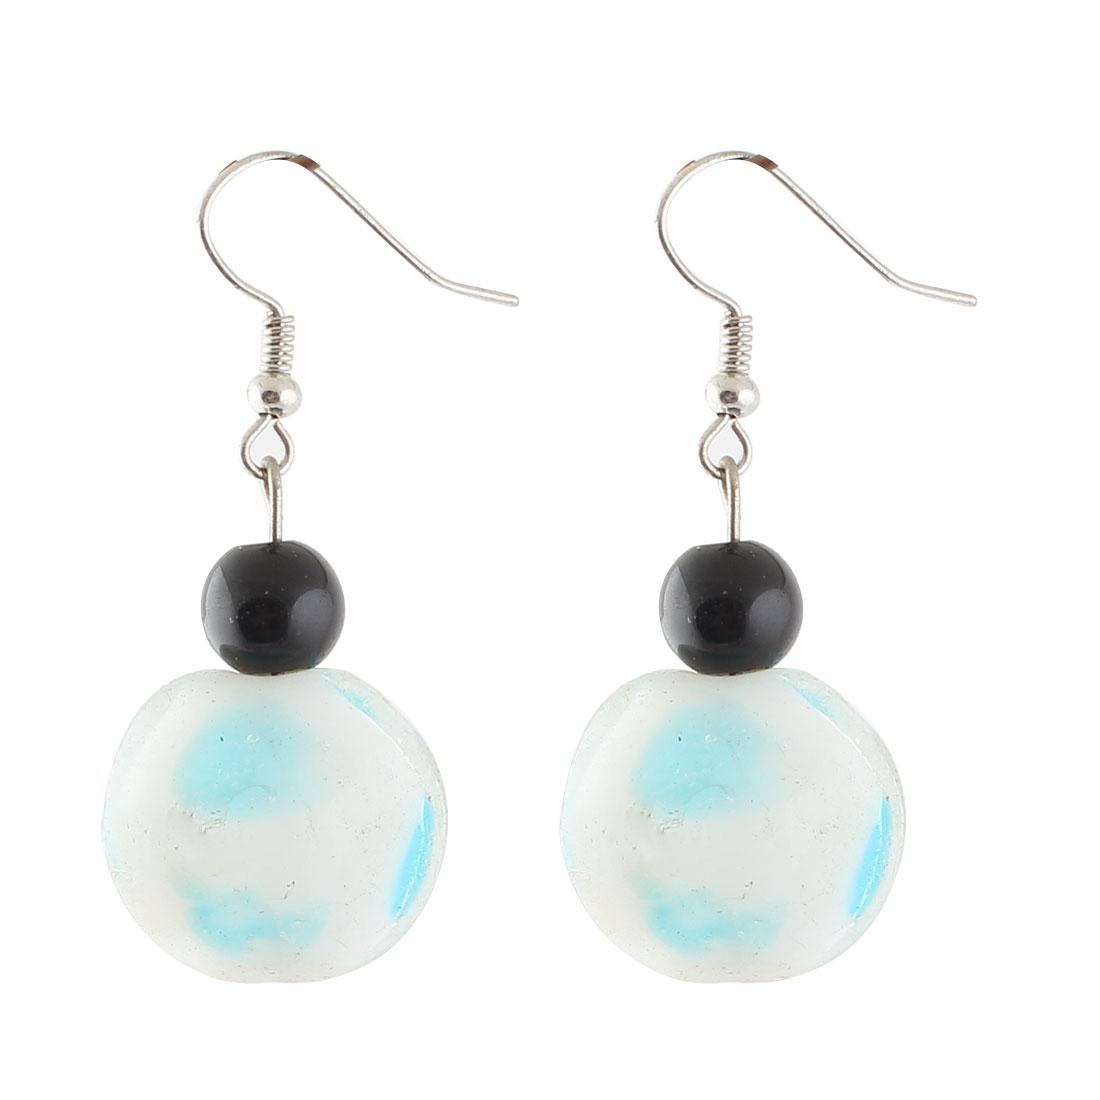 Plastic Bead Dotted Pattern Pendant Fish Hook Earrings Blue Pair